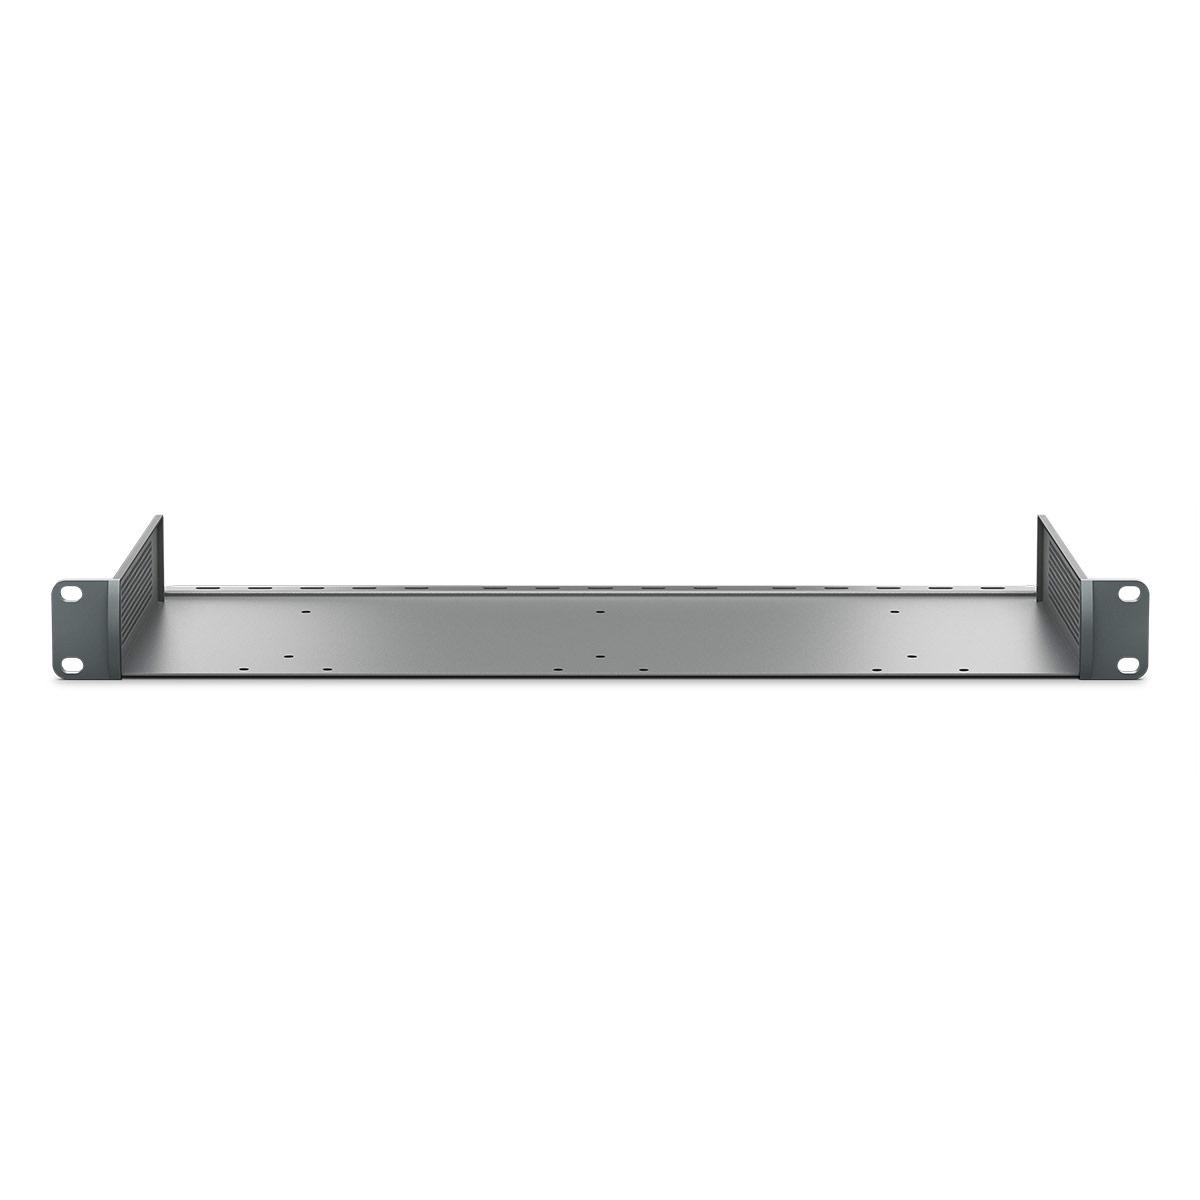 Blackmagic Teranex Mini Rack Shelf Jigsaw24